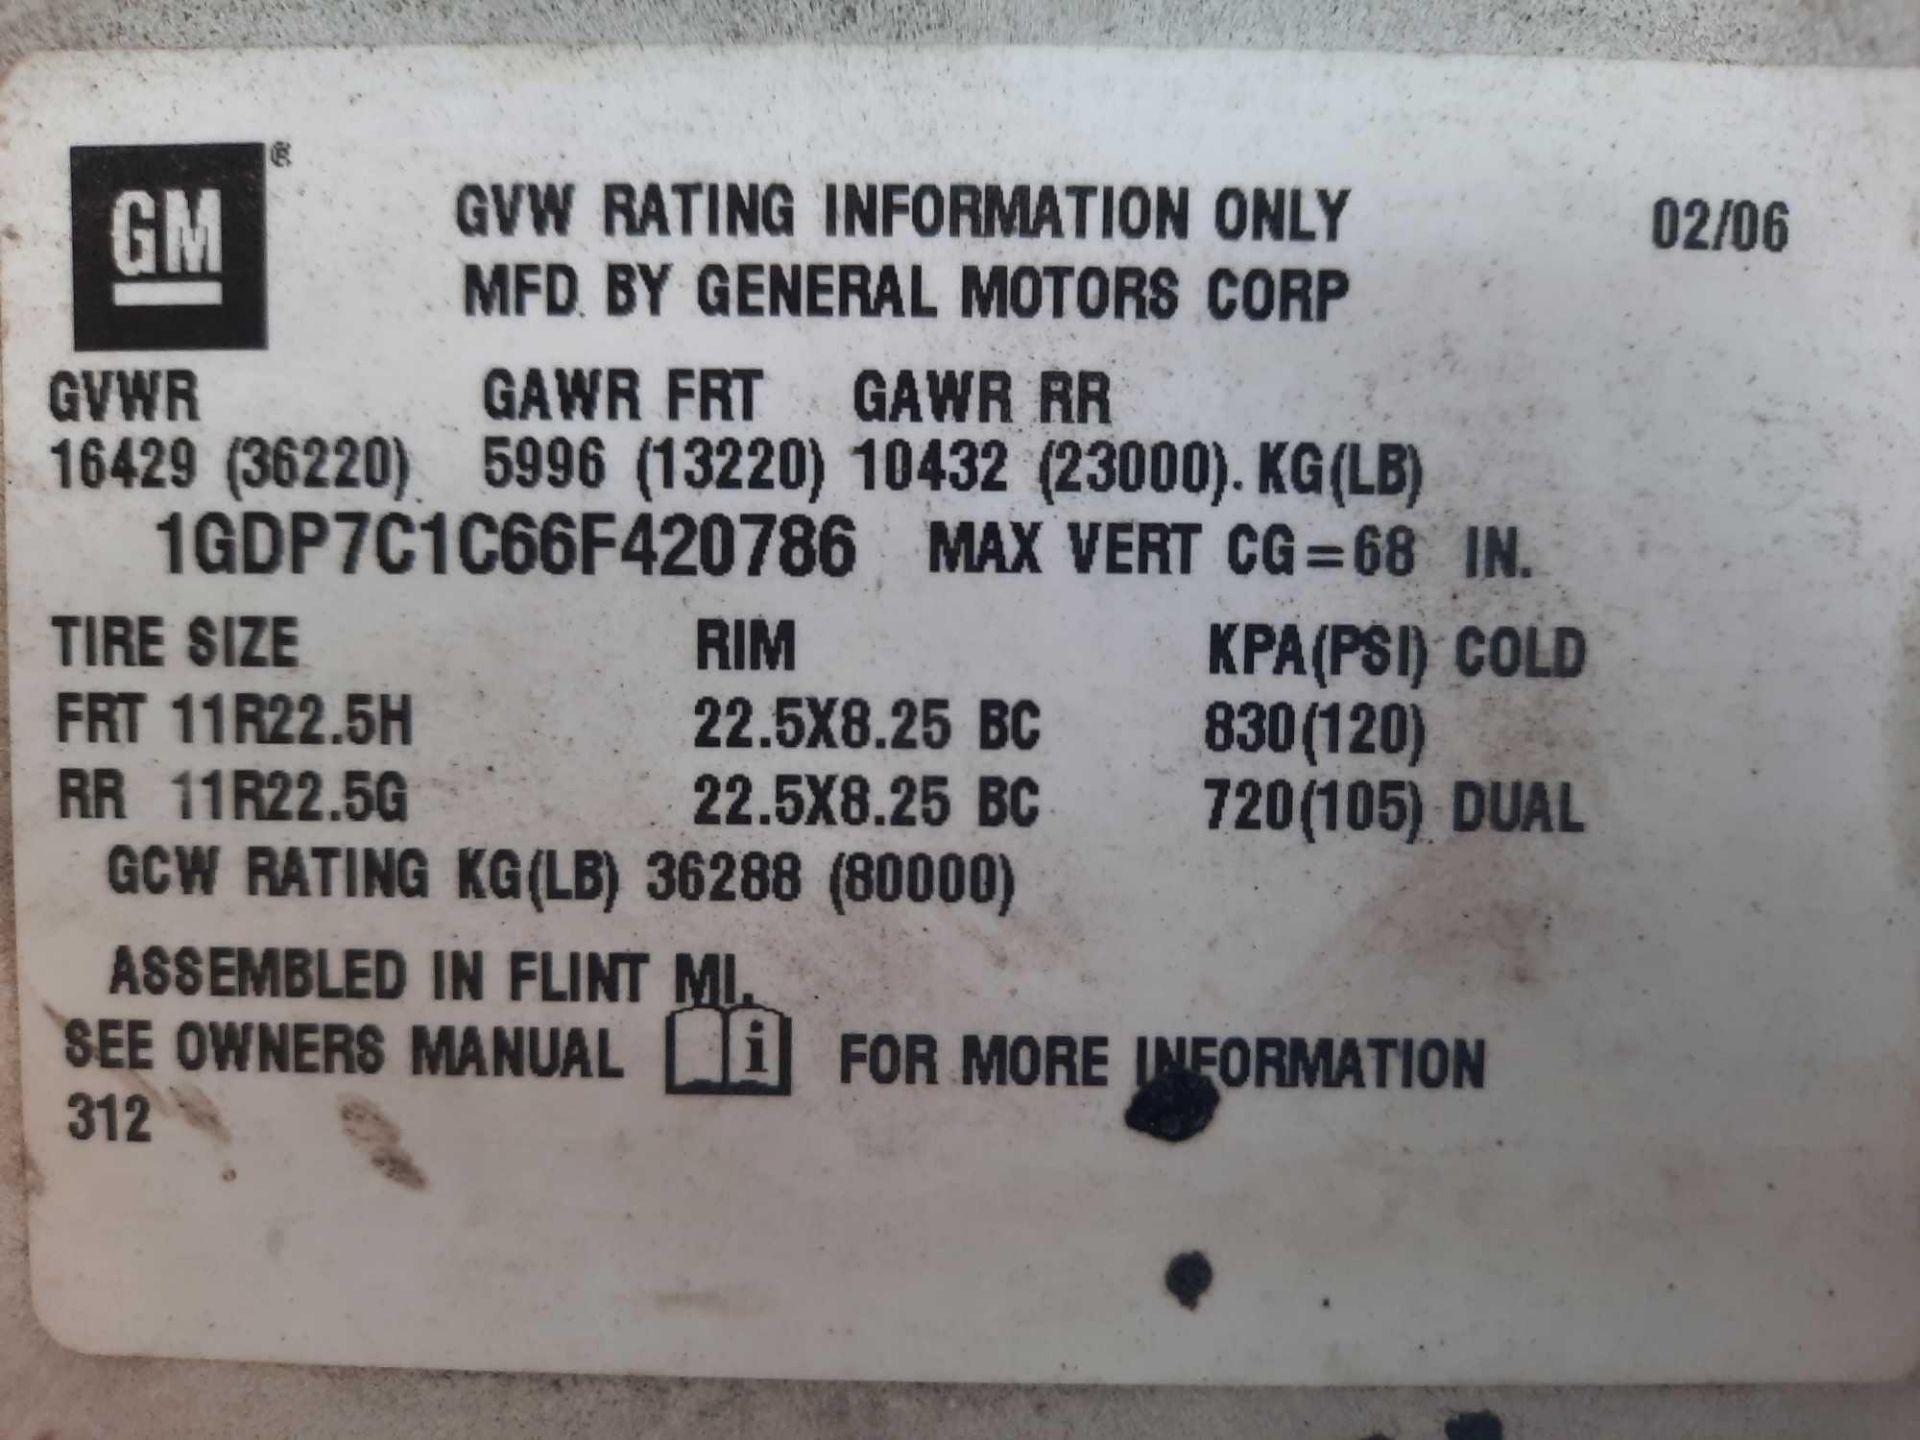 2006 GMC 7500 S/A 10' DUMP TRUCK (VDOT UNIT: R08291) - Image 5 of 19